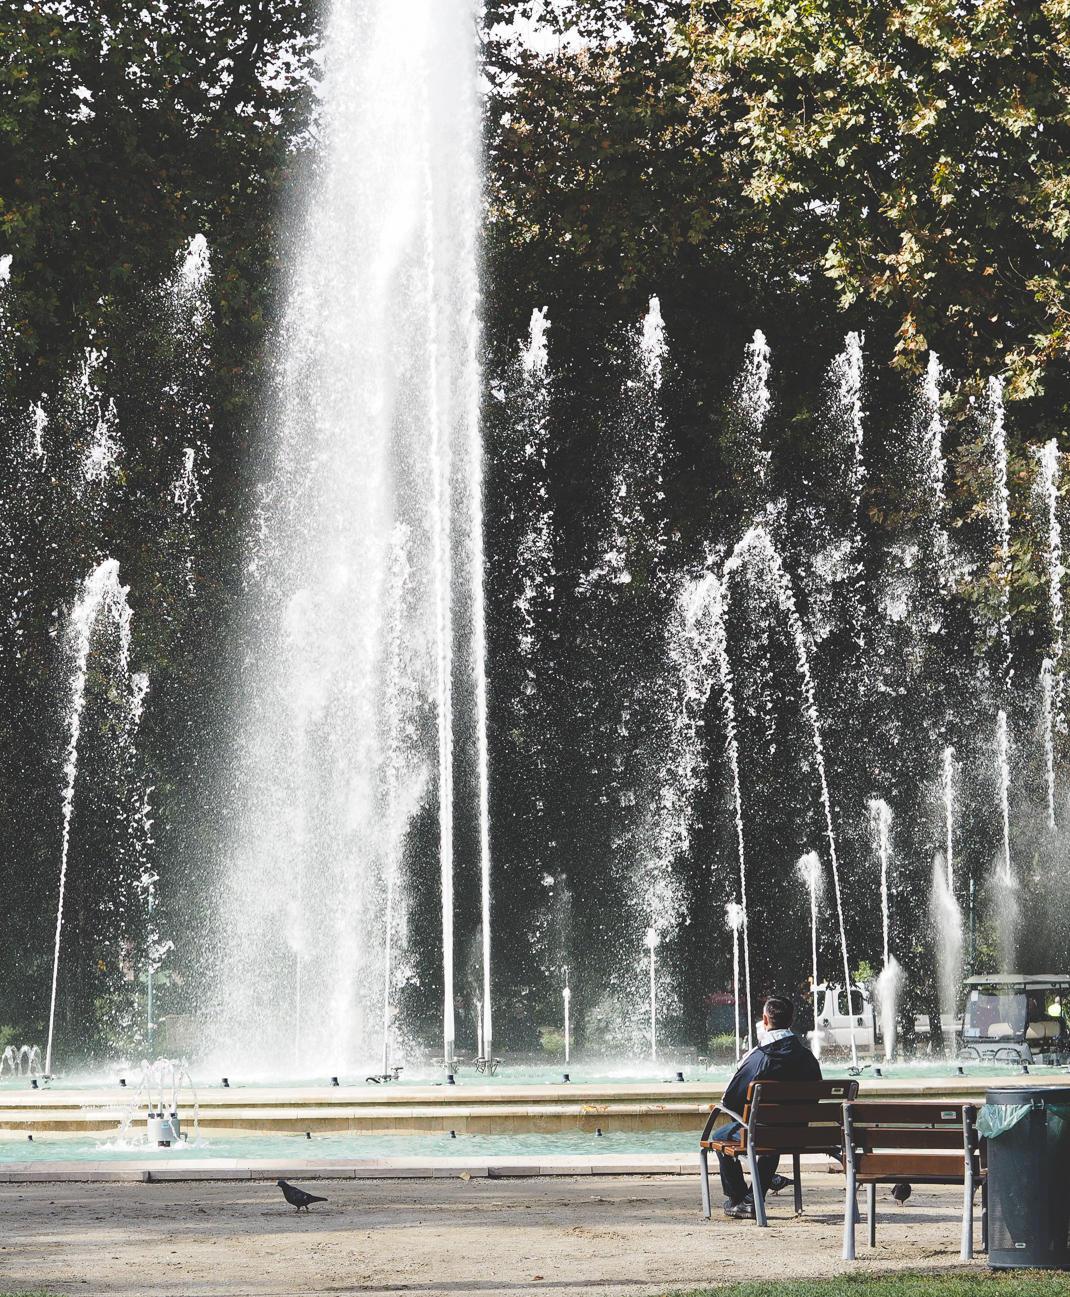 budapest margaret's island musical fountain